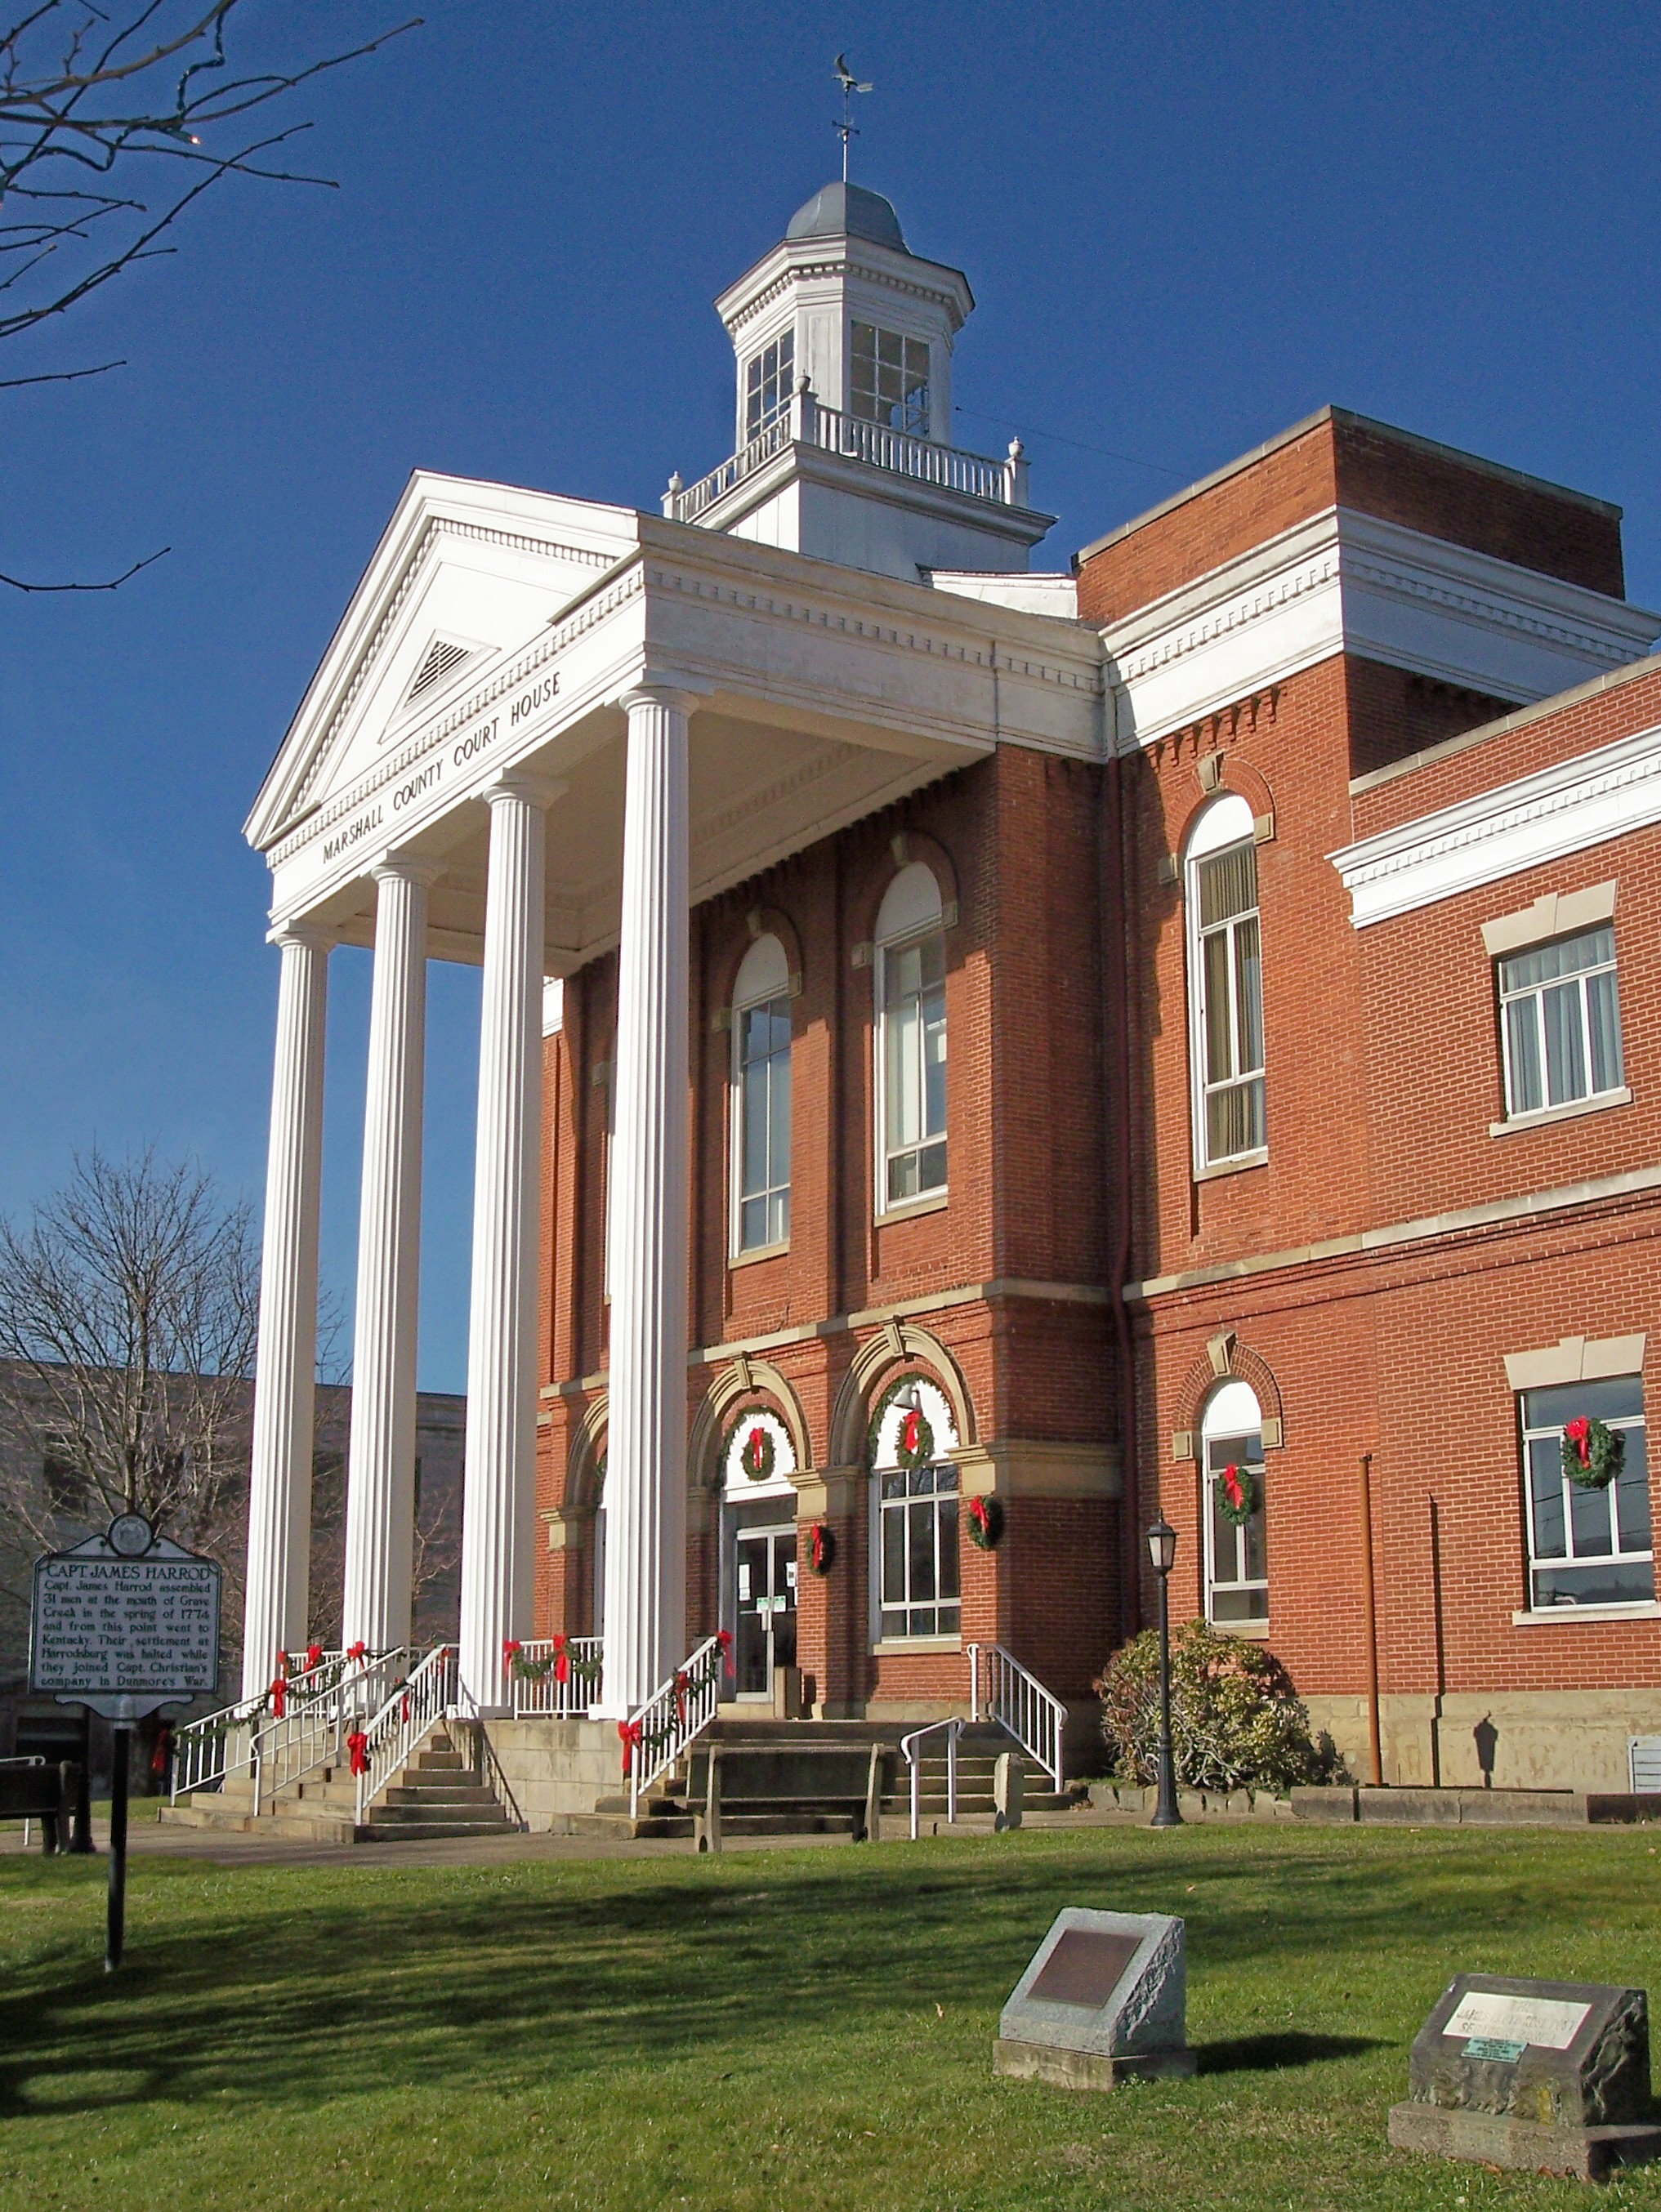 File:Marshall County Courthouse West Virginia.jpg - Wikimedia Commonsbalance of marshall county